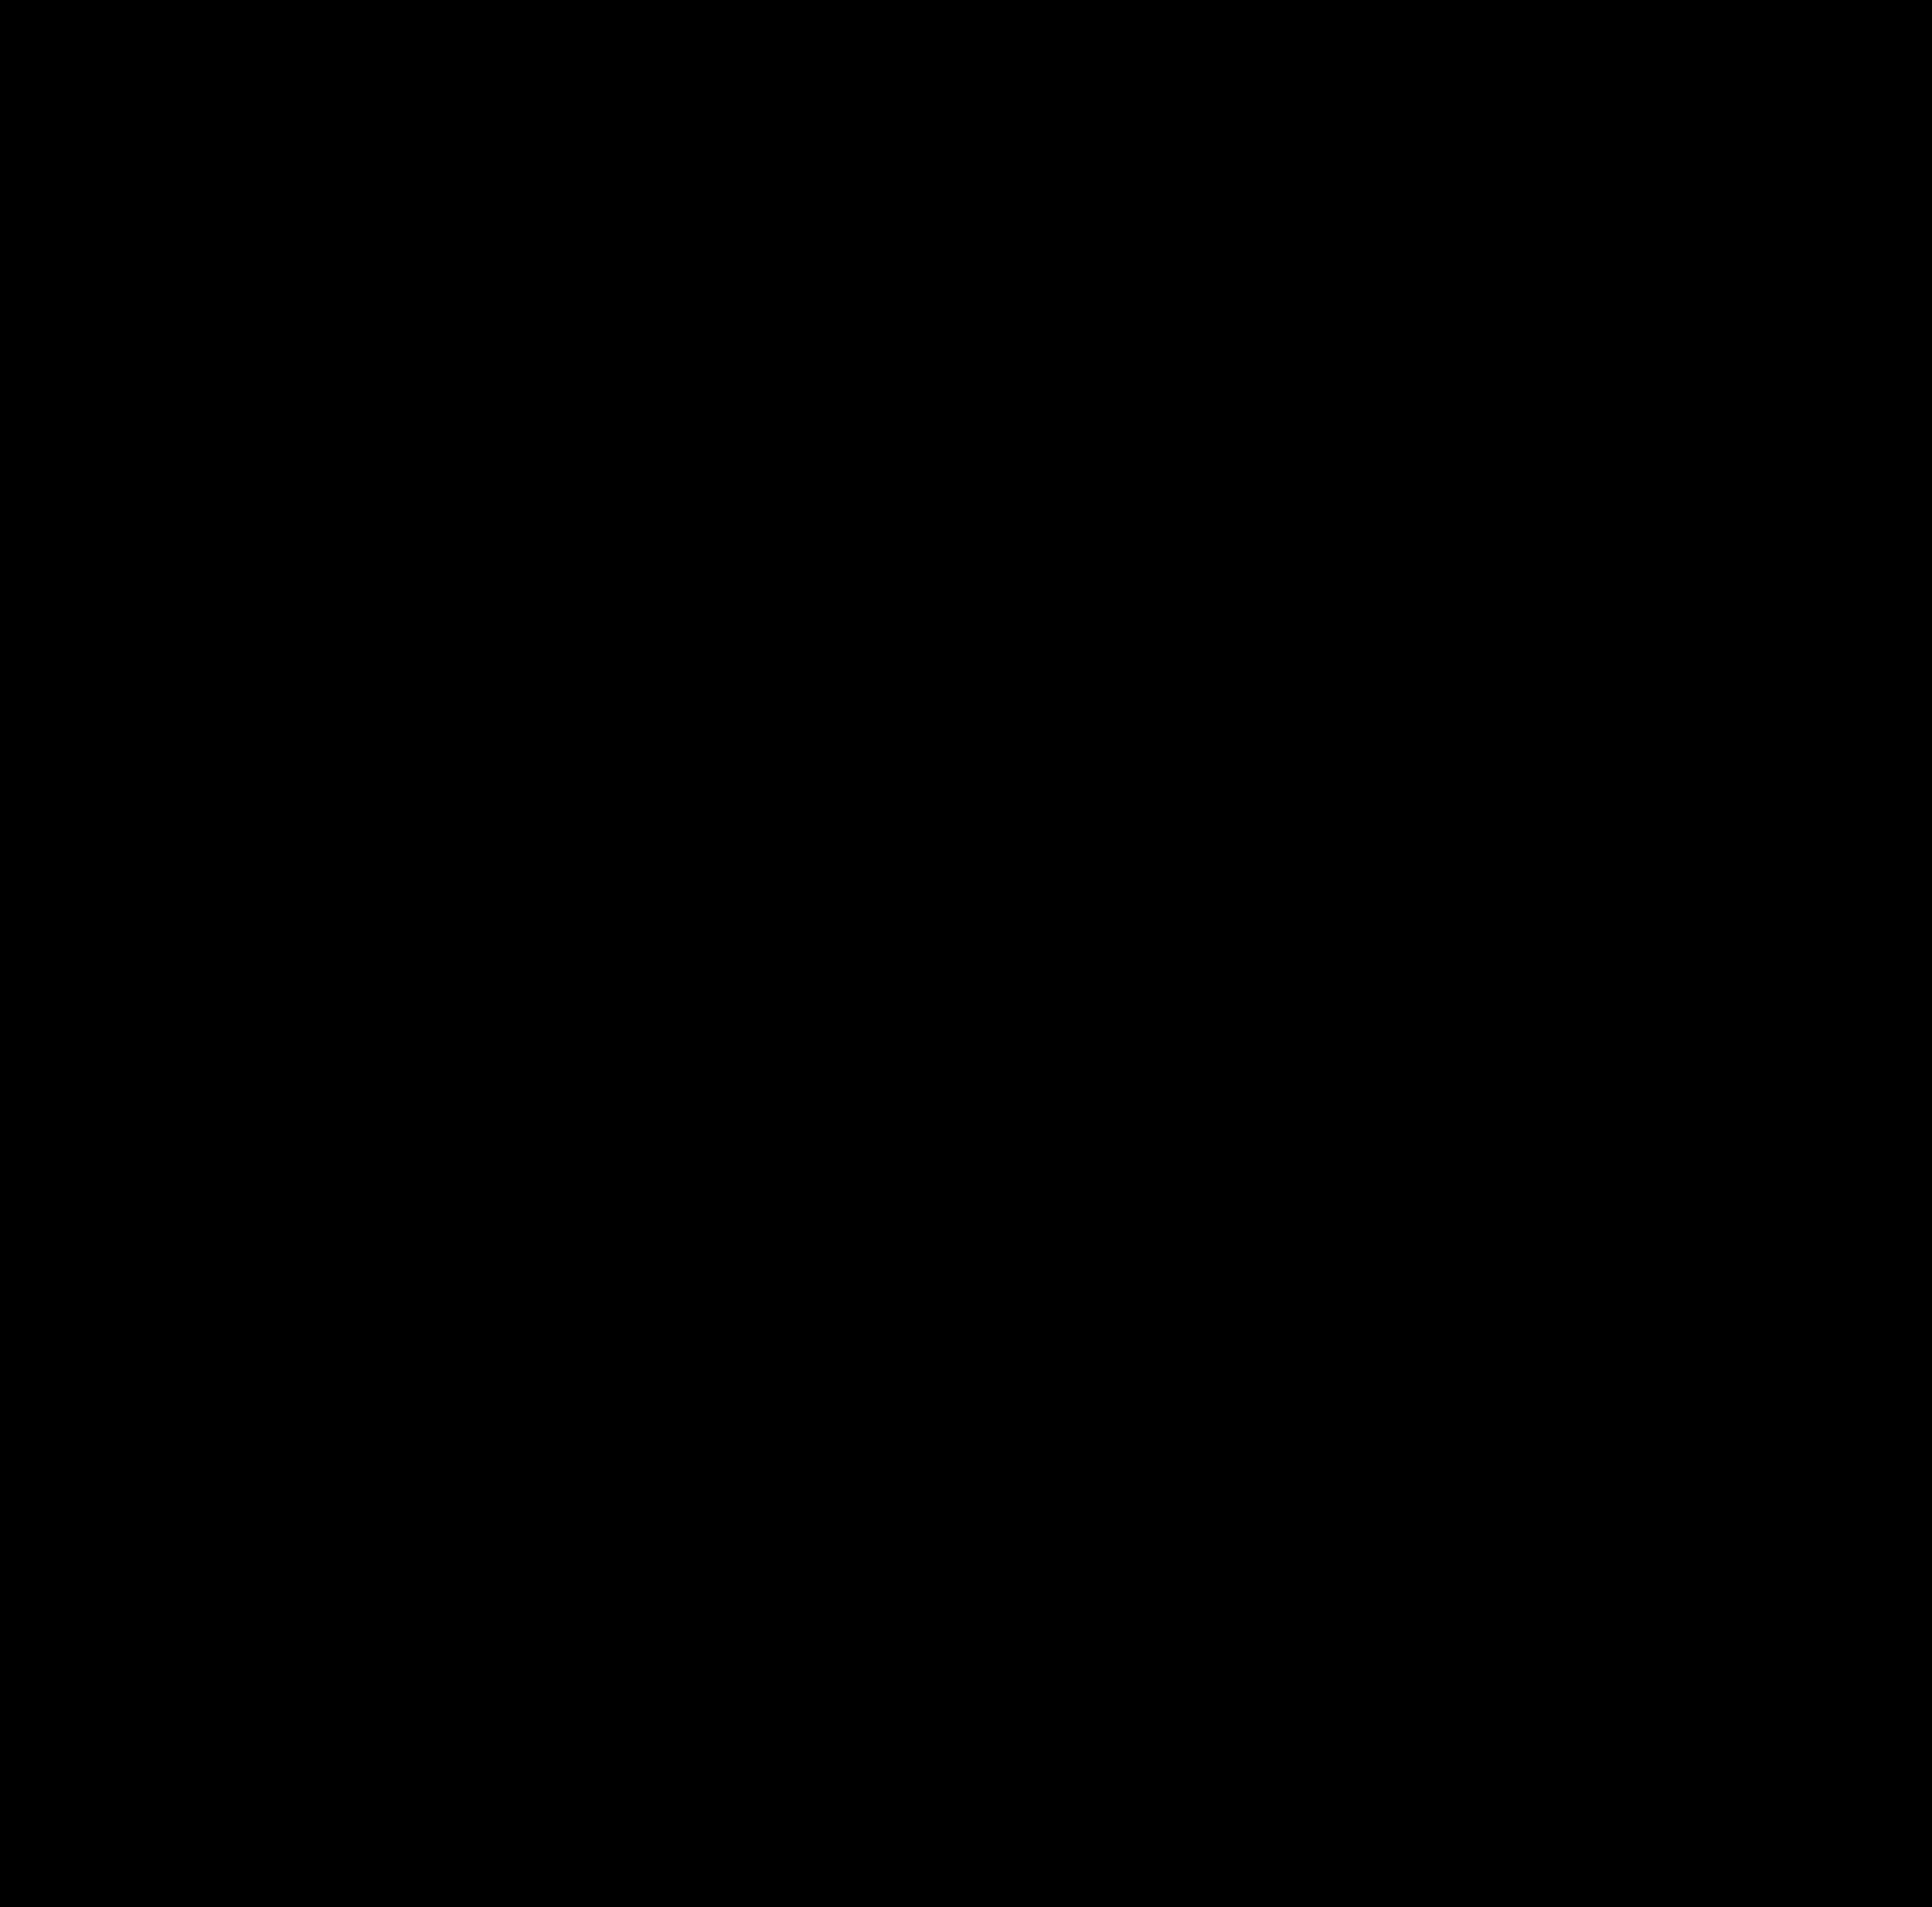 Physics math symbols brinks safe 5059 saudi arabia flag vector pi wikipedia the free encyclopedia symbols pinterest 6df13b892e8fb995d32812a592cb8e8b 333618284871596466 physics math symbols physics math symbols buycottarizona